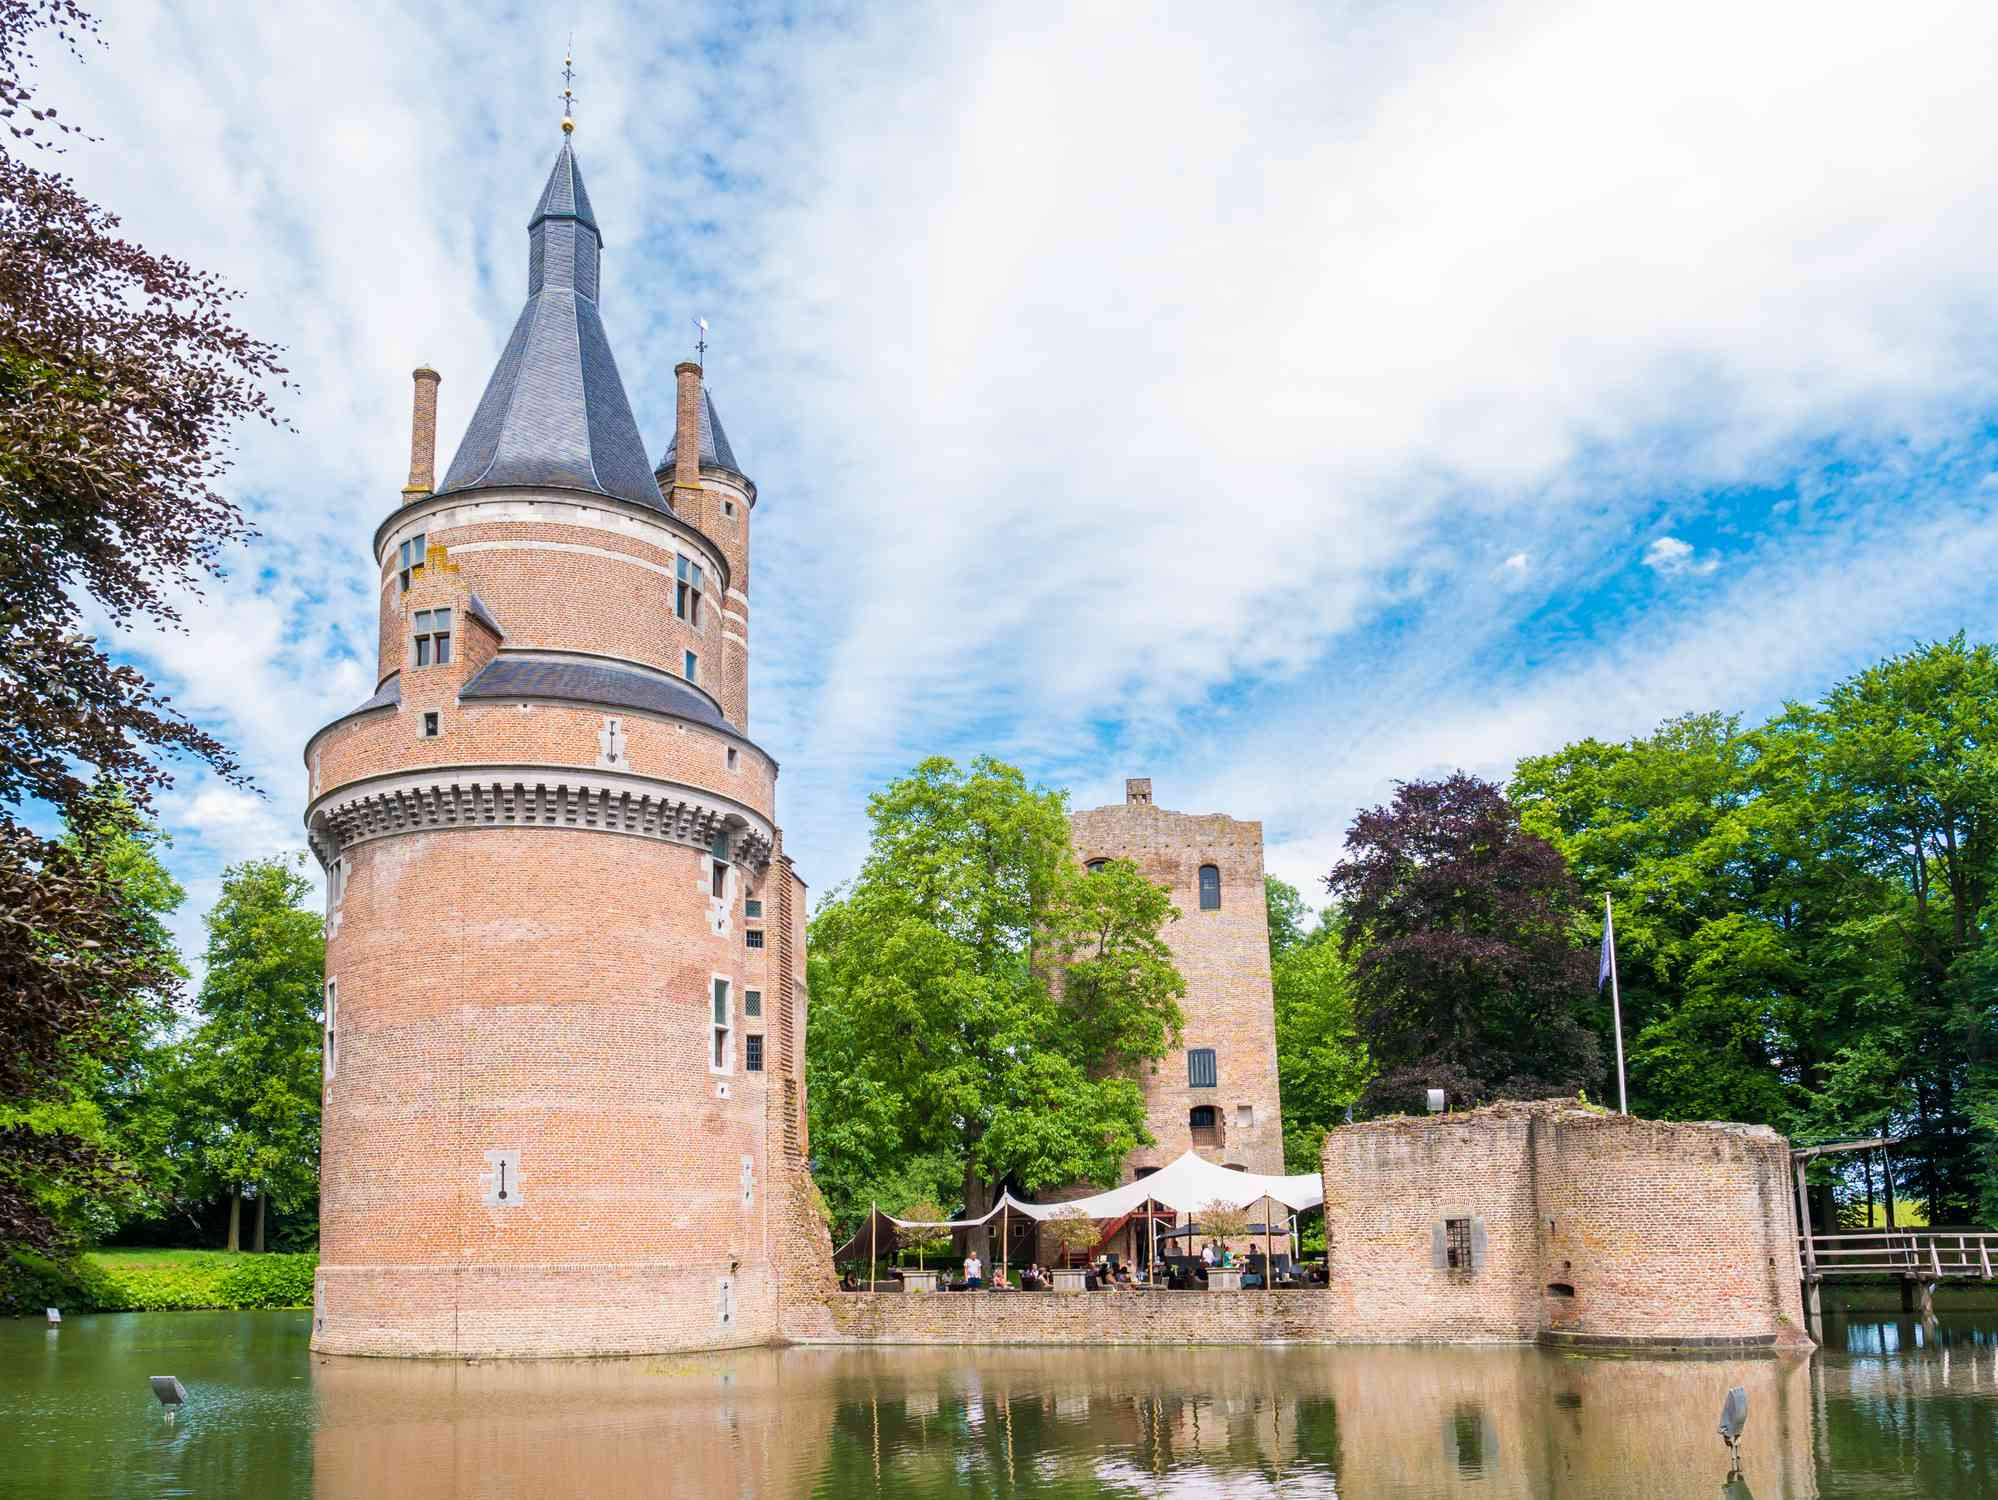 Duurstede castle with Burgundian tower and donjon in Wijk bij Duurstede, Netherlands